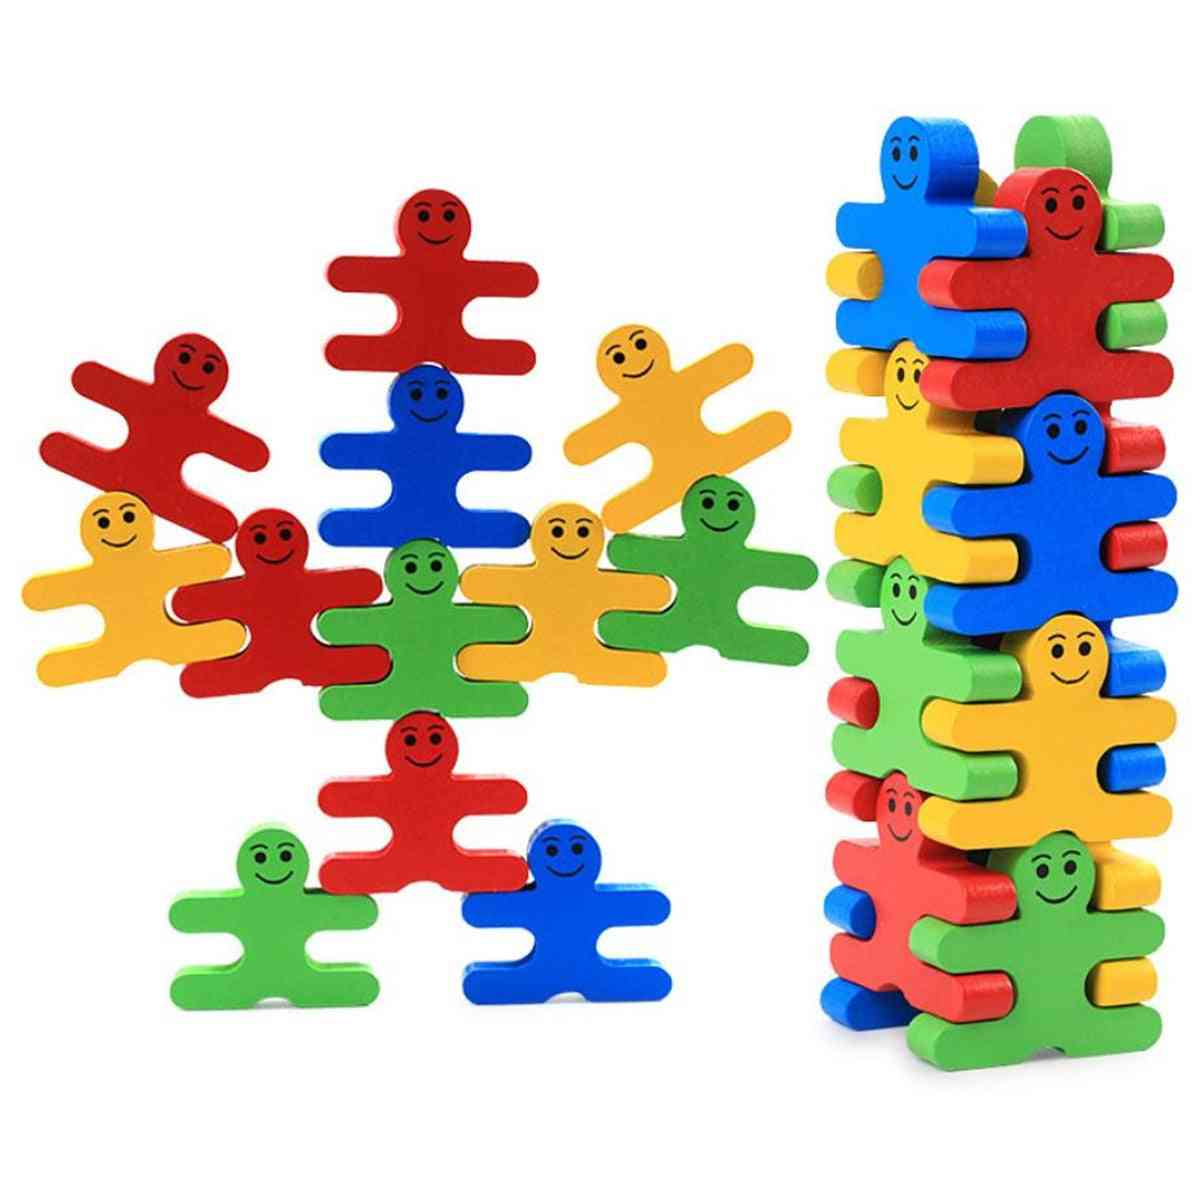 Small Cartoon Figure Style Wooden Ballance Fucntion Building Block Toy (light Green)